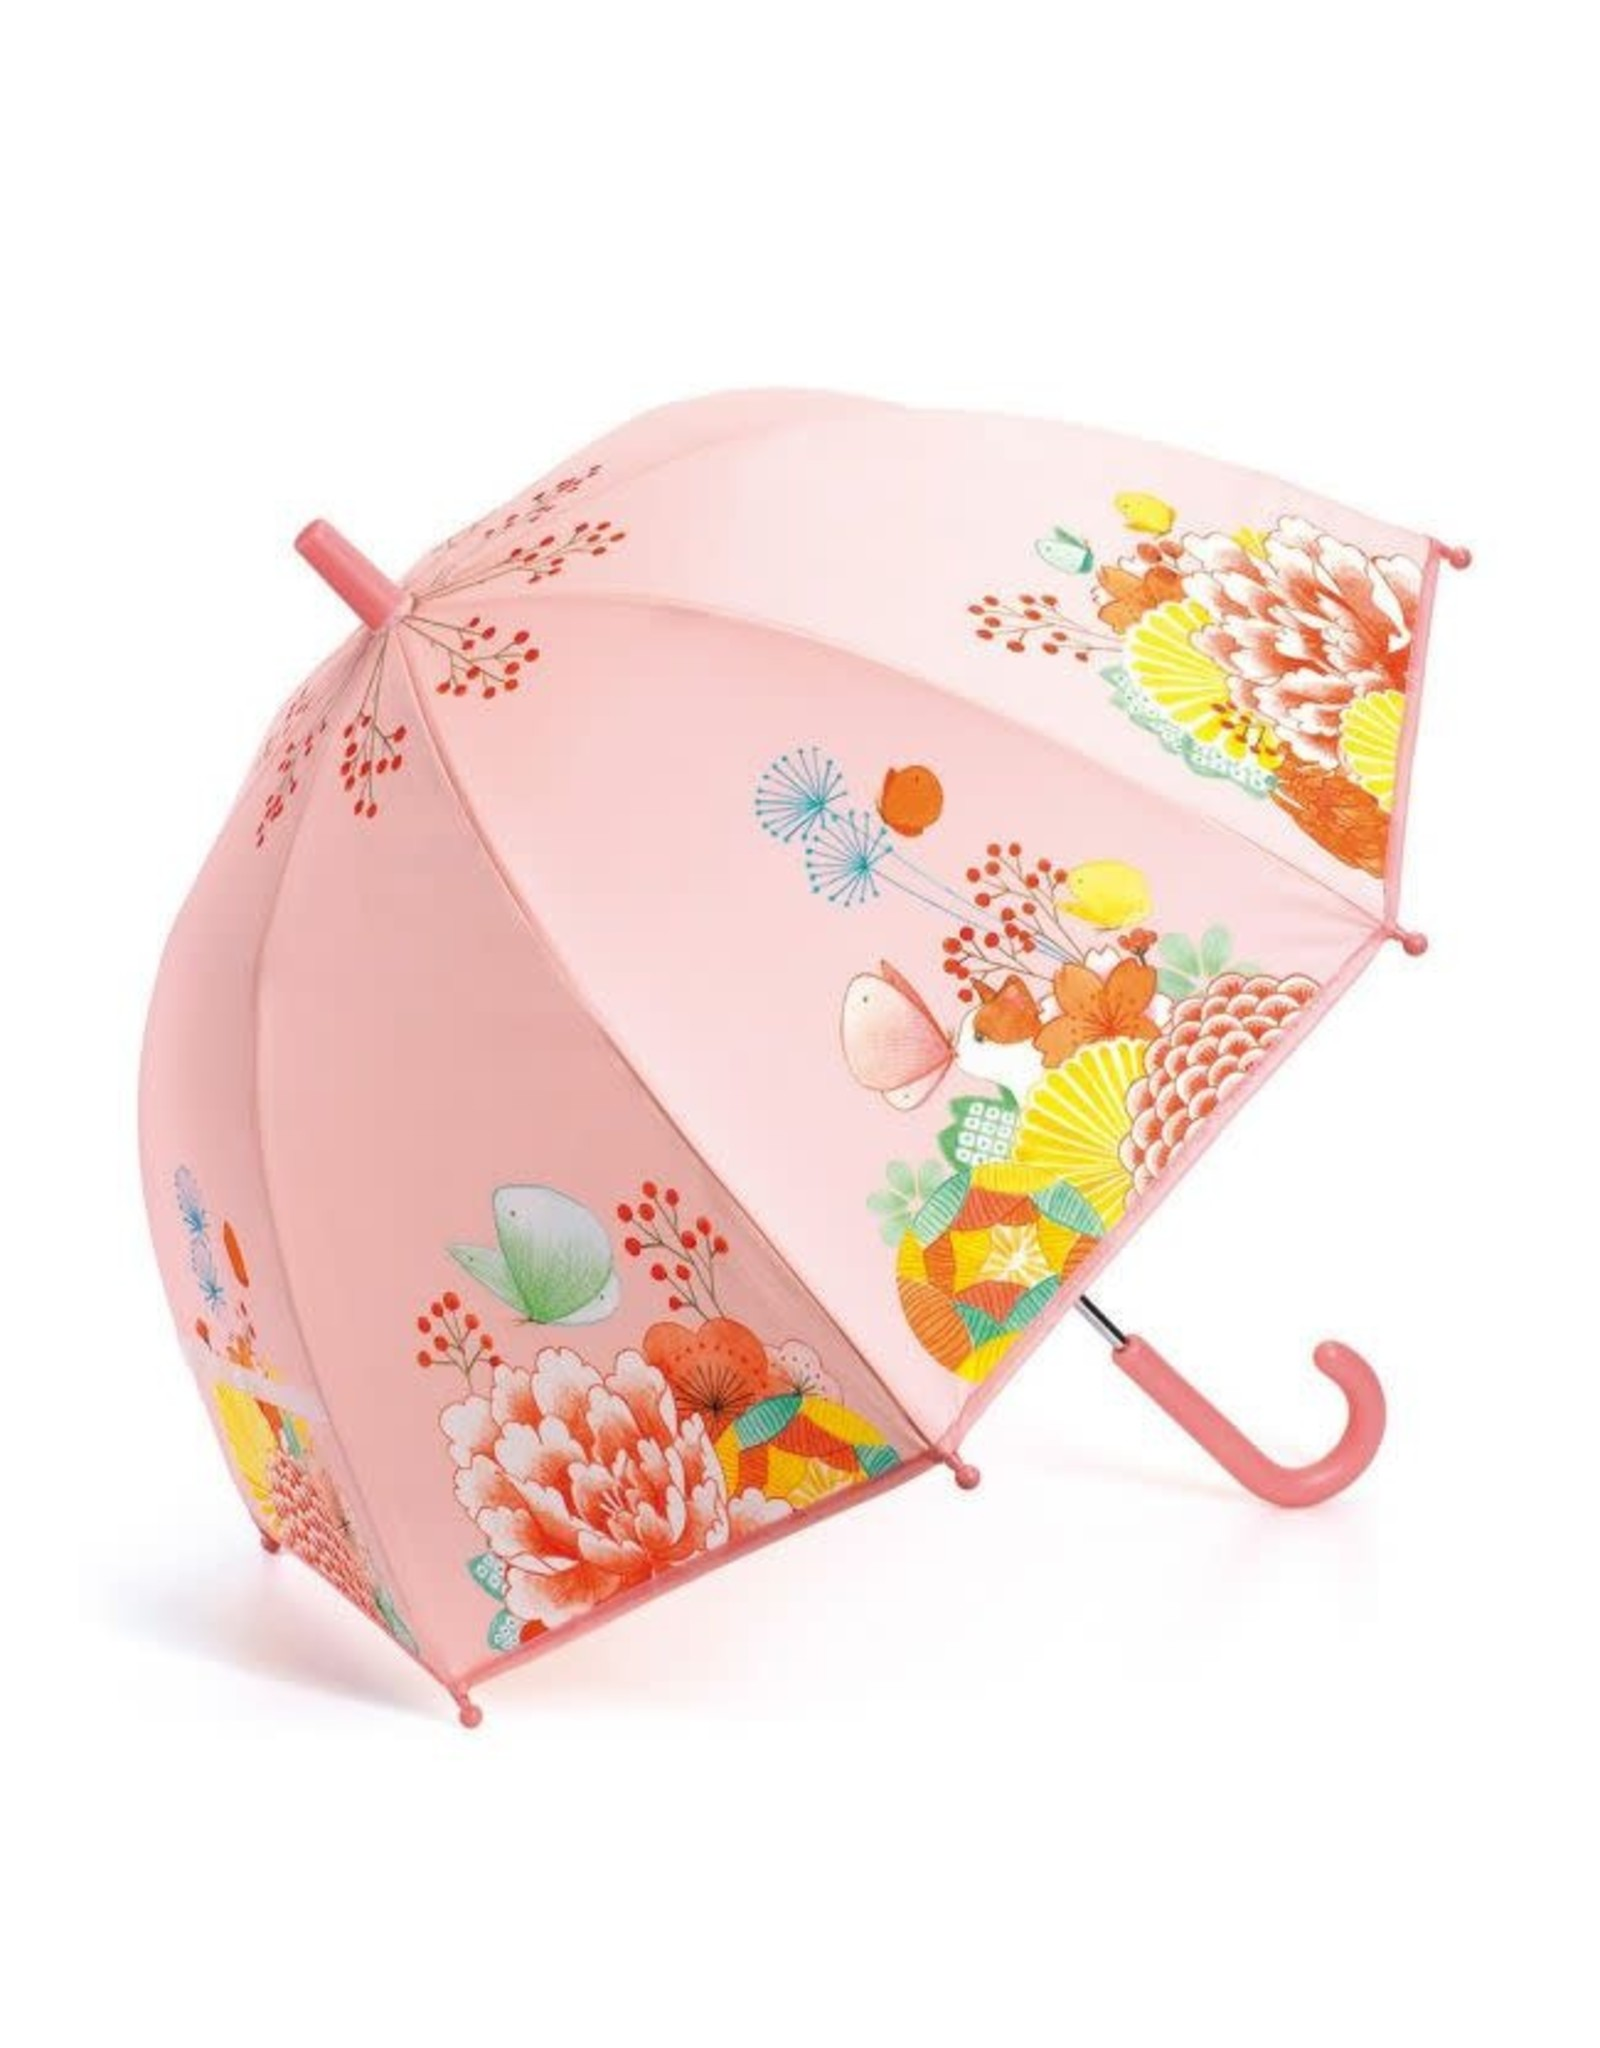 Djeco Flower Garden Umbrella